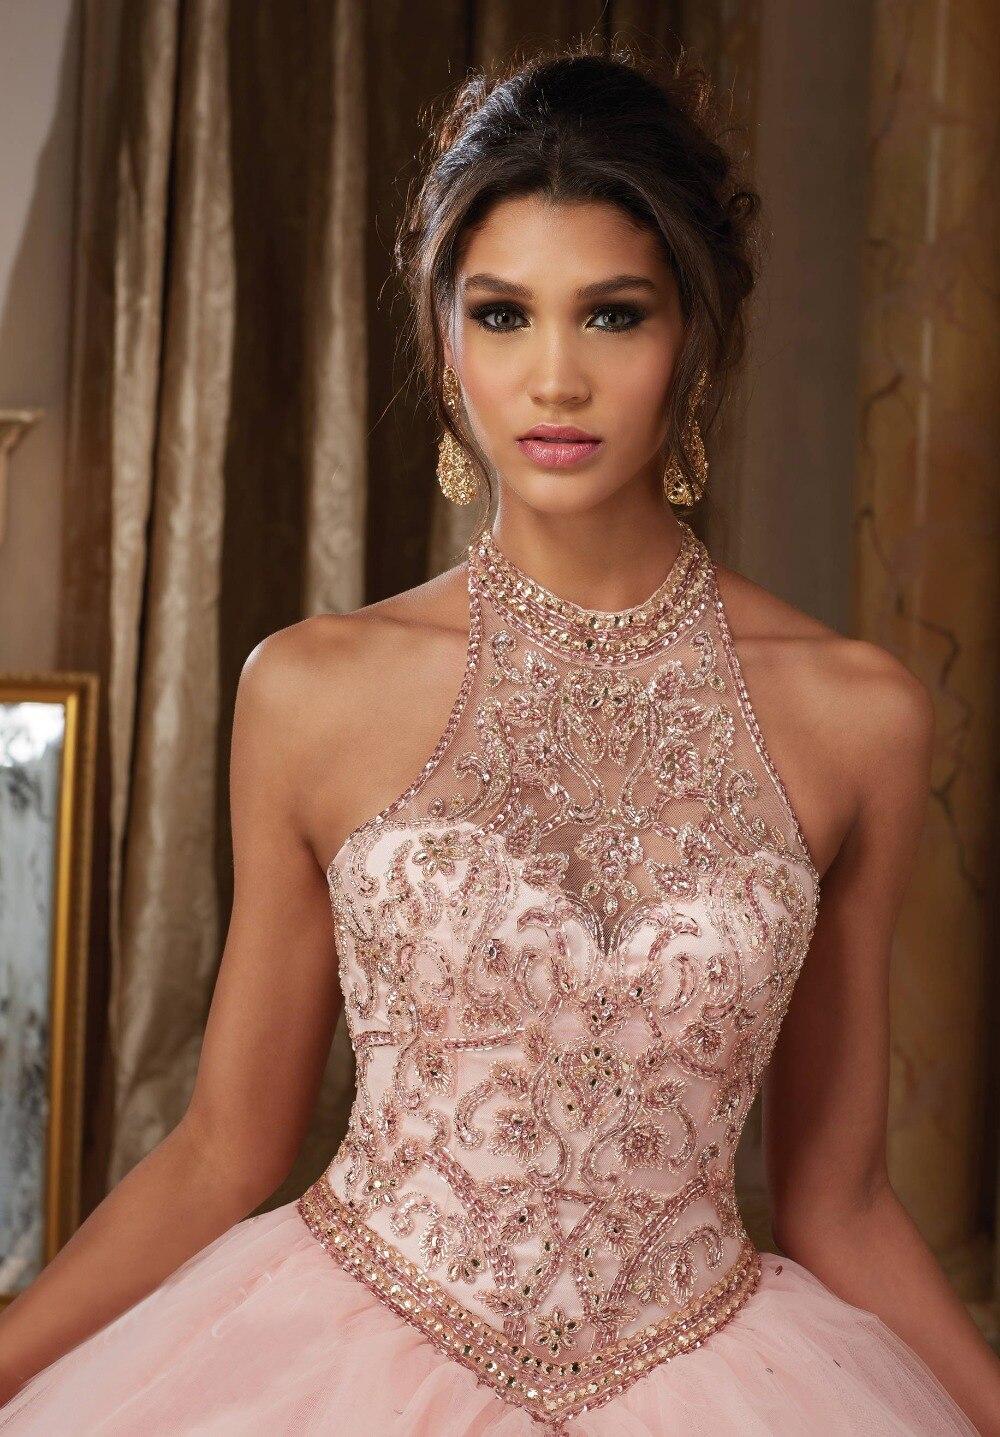 6b2abc78a Cheap Lilac Quinceanera Dresses Beaded Tulle vestidos de quinceaneras cortos  2016 Ball Gowns Prom Dress Sweet 16 Dresses-in Quinceanera Dresses from ...